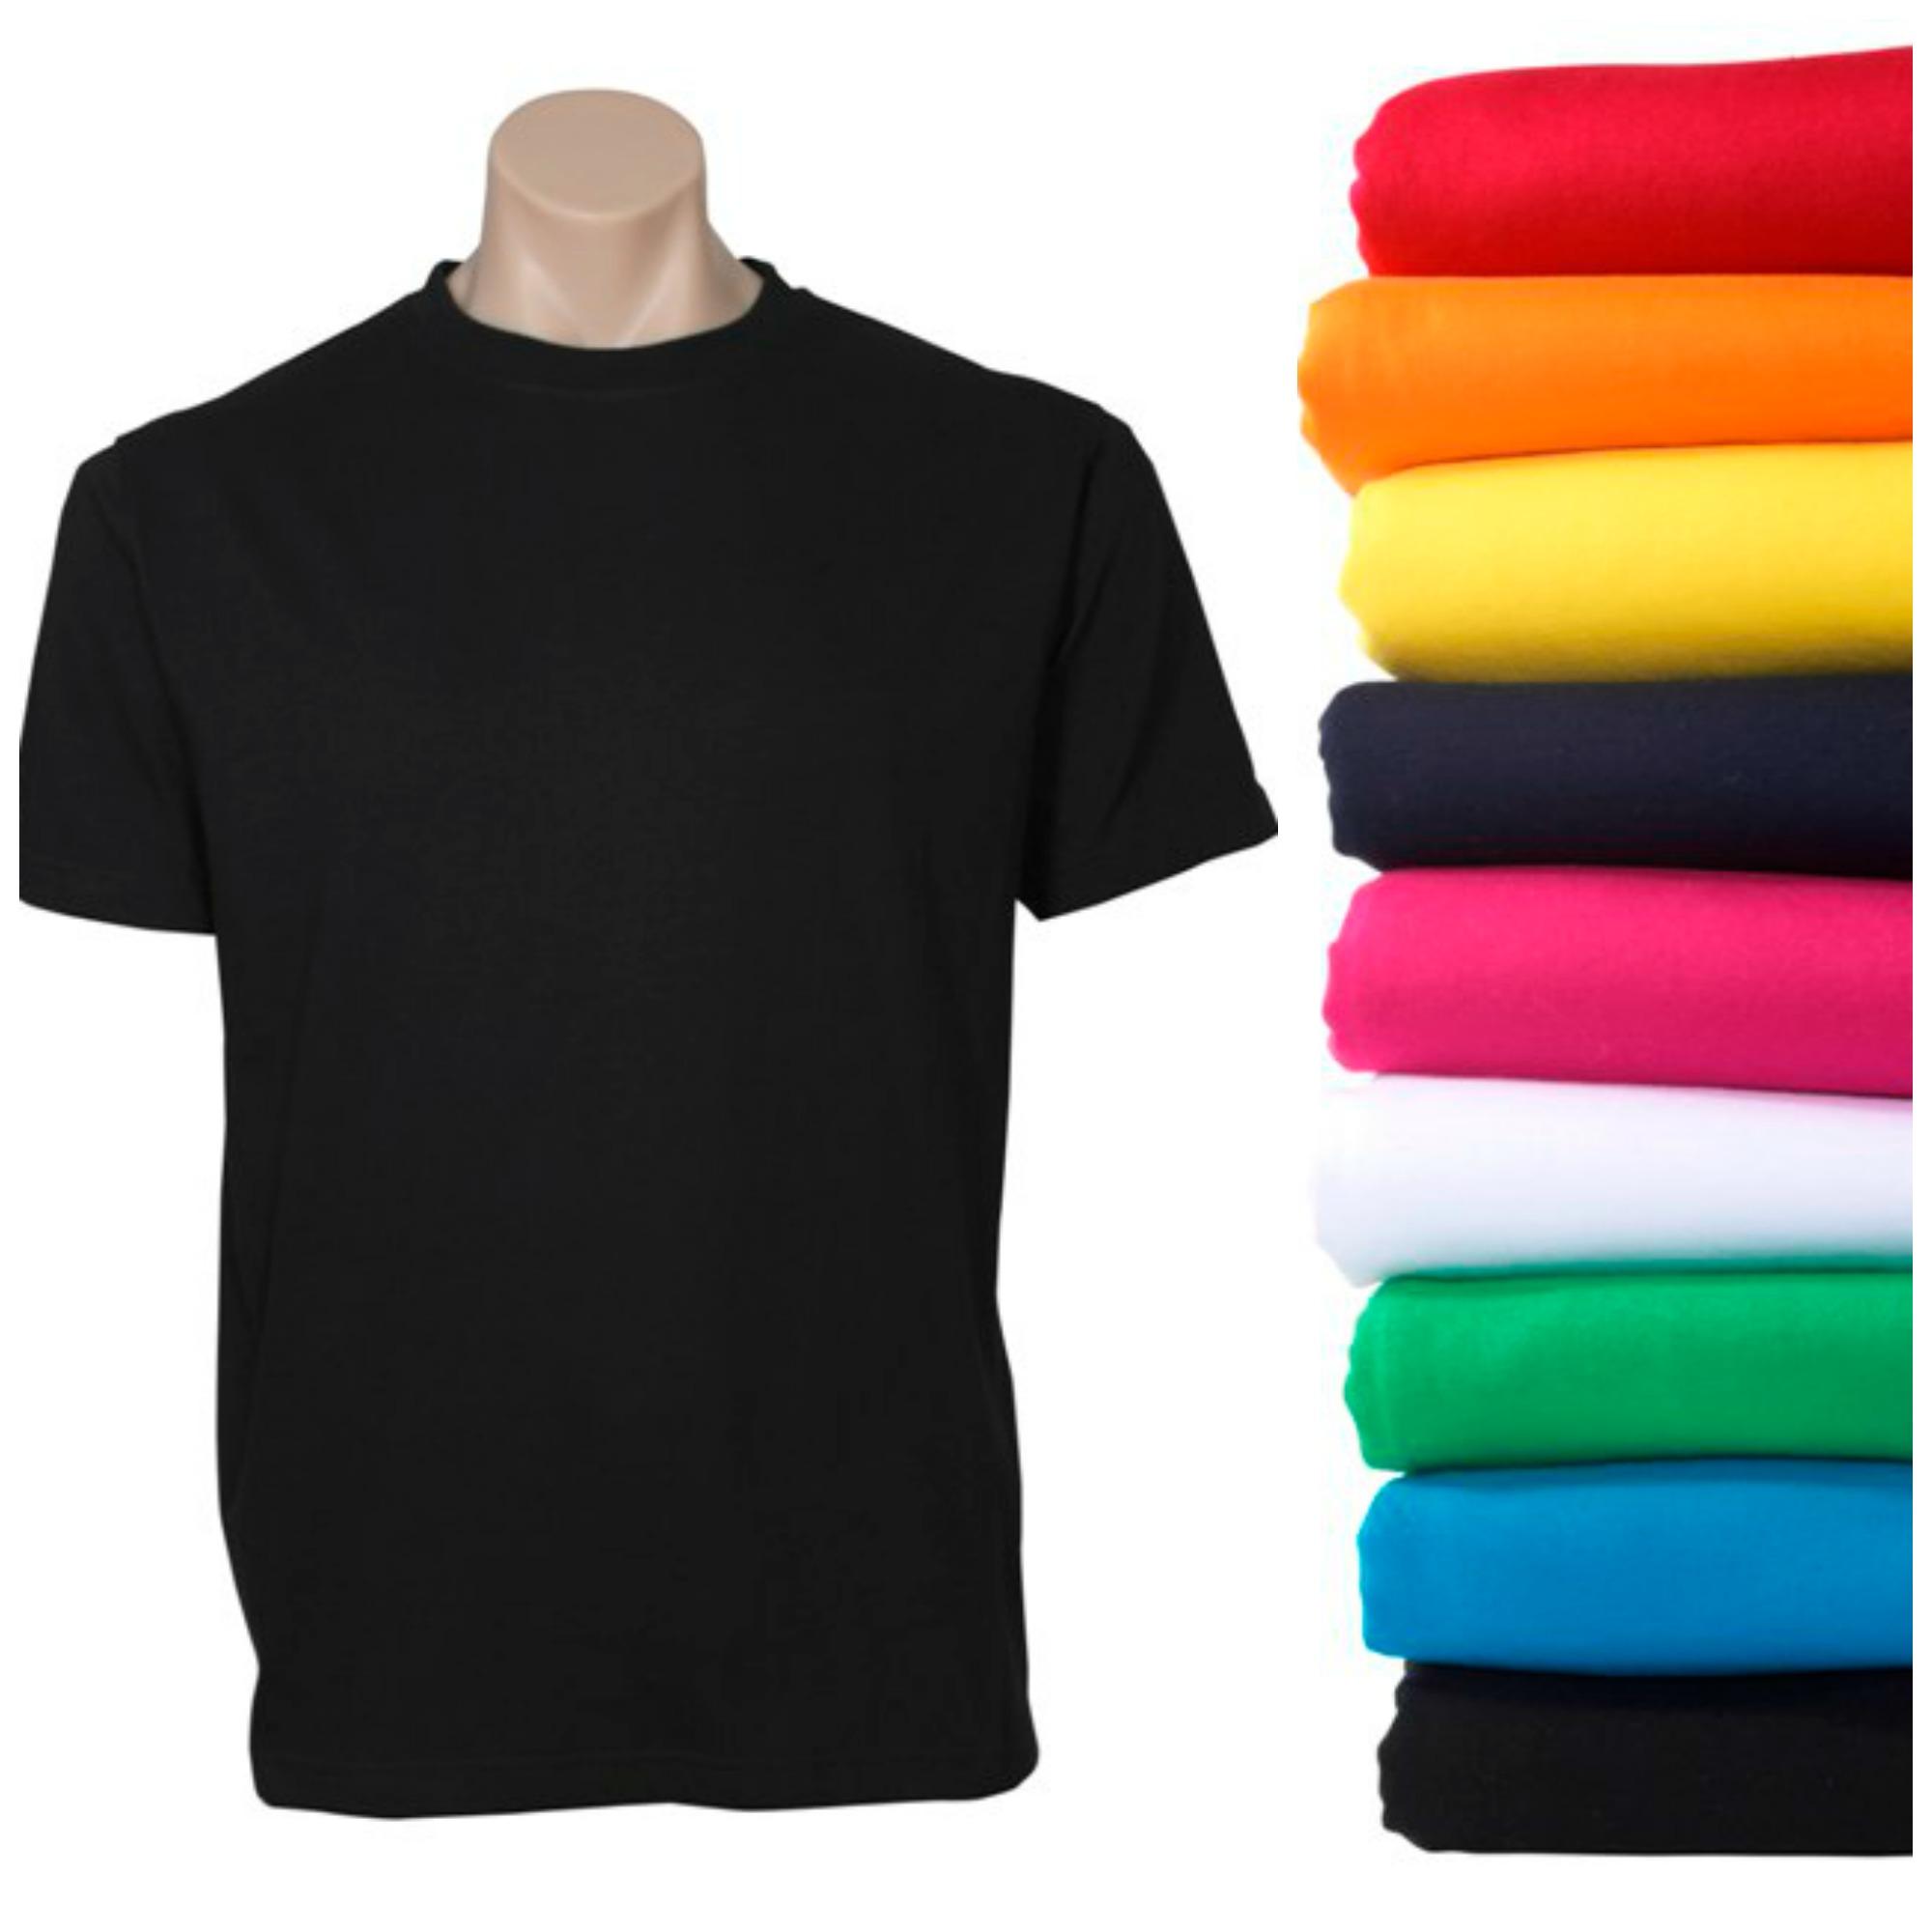 Plain T Shirt 100% COTTON Basic Blank Tee Men's Ladies Casual BULK XS-5XL Adults